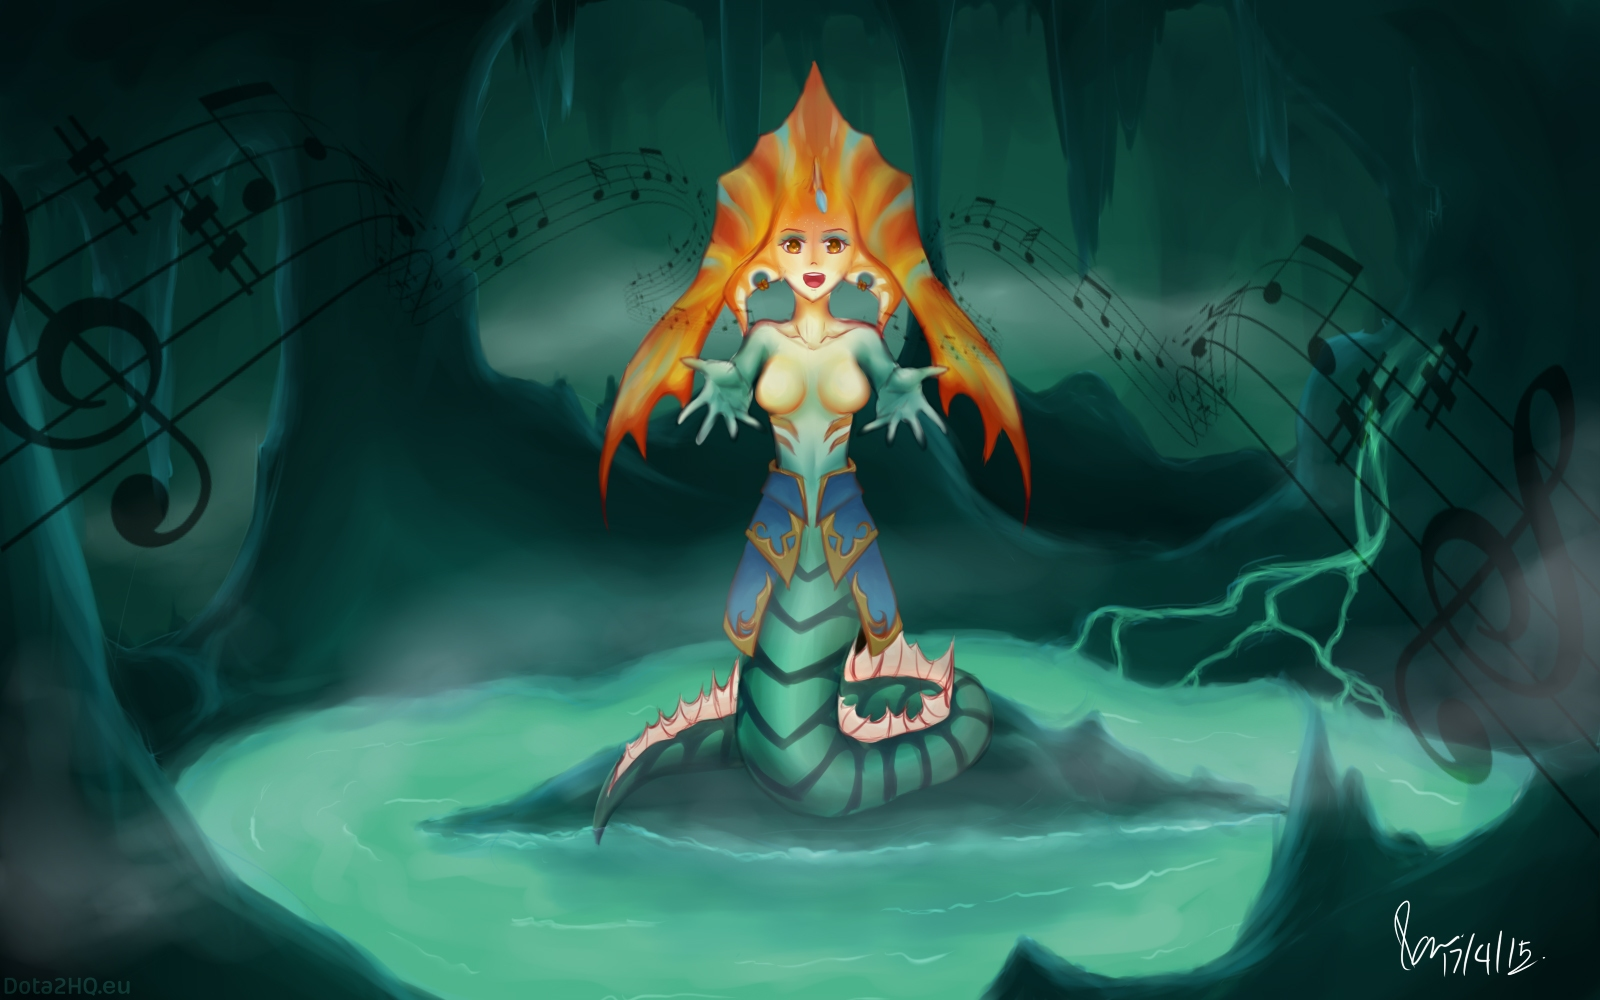 Dota 2 Naga Siren Fan Art , HD Wallpaper & Backgrounds